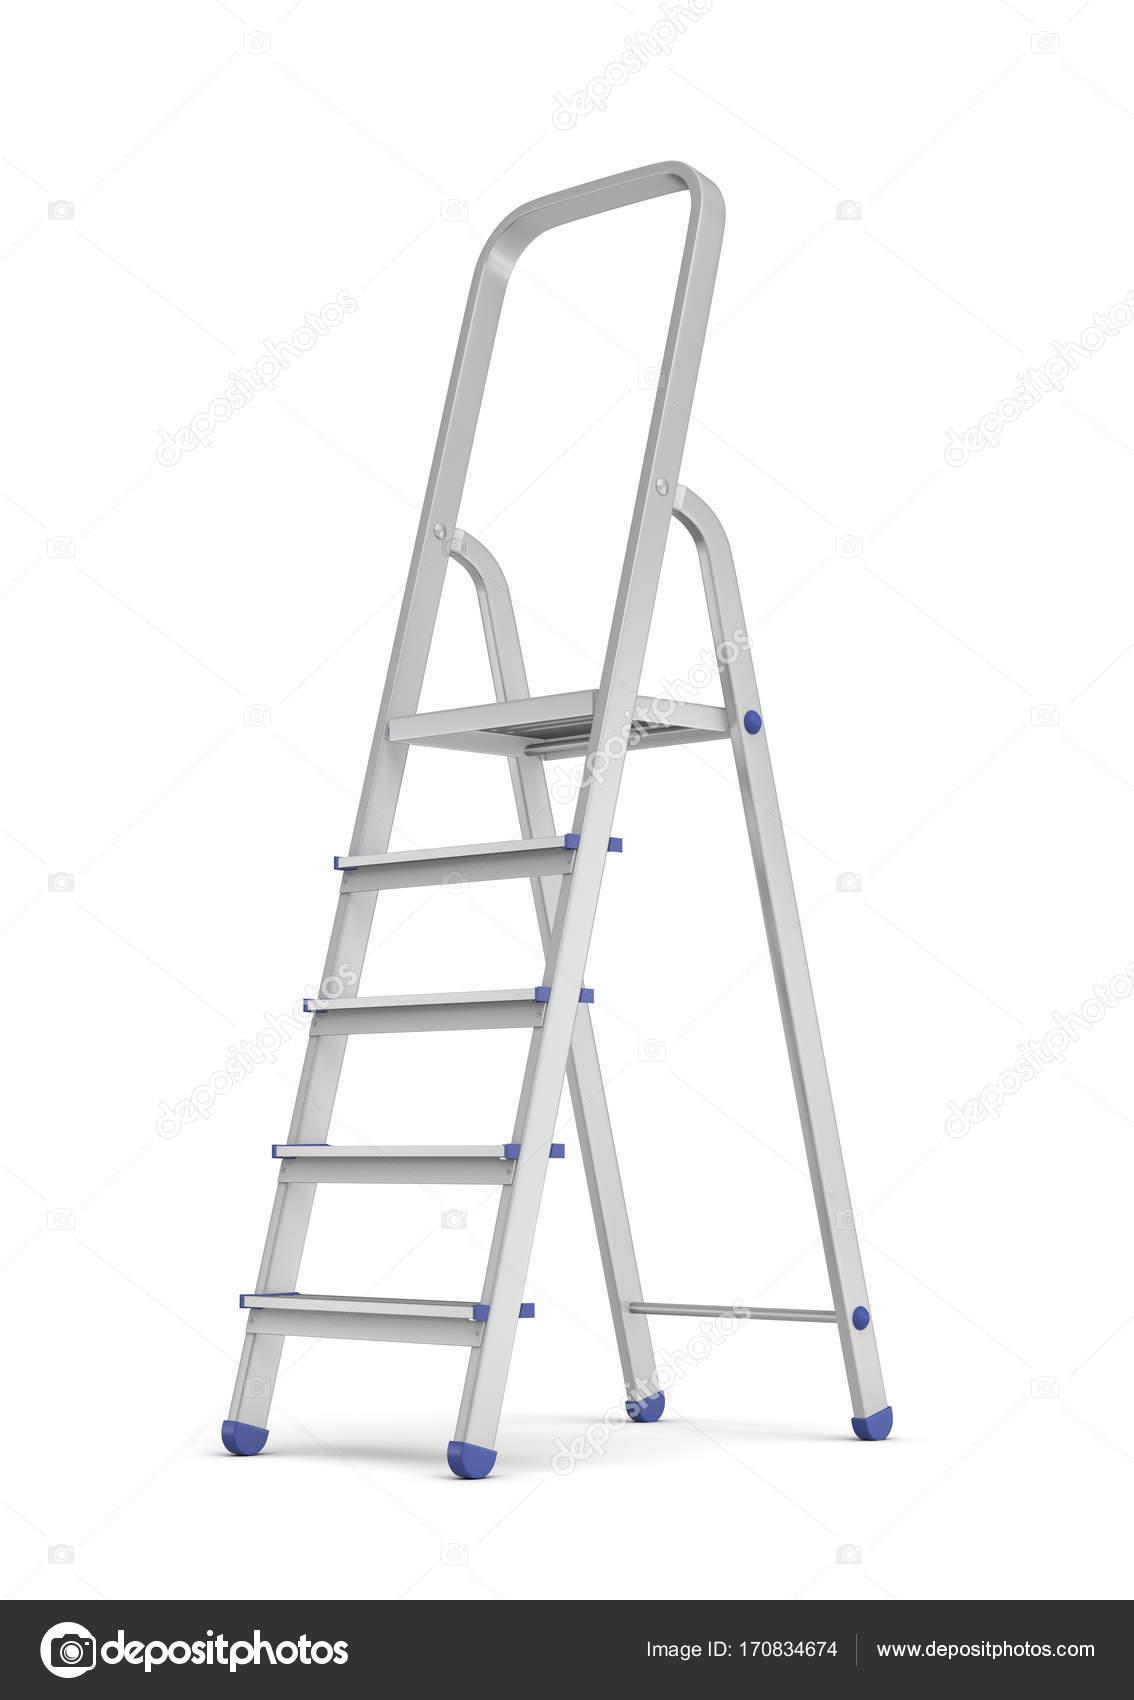 3d rendering of a metal builders step ladder with blue fittings in ...